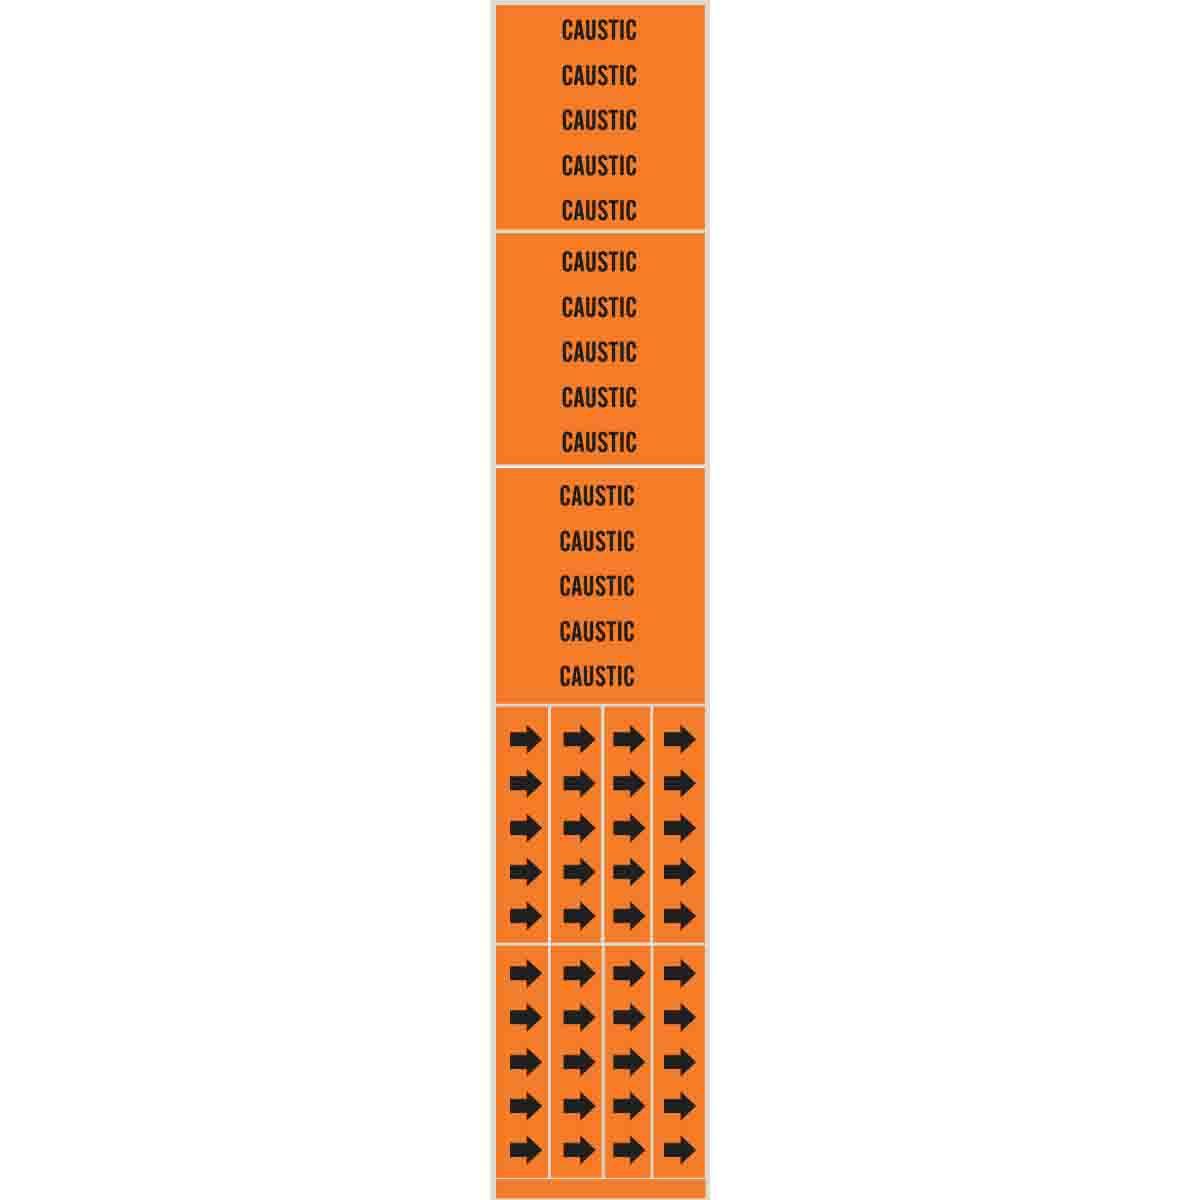 Black On Yellow Pressure Sensitive Vinyl Legend Drain 1 1//8 Height X 7 Width Brady 7091-4 Self-Sticking Vinyl Pipe Marker B-946